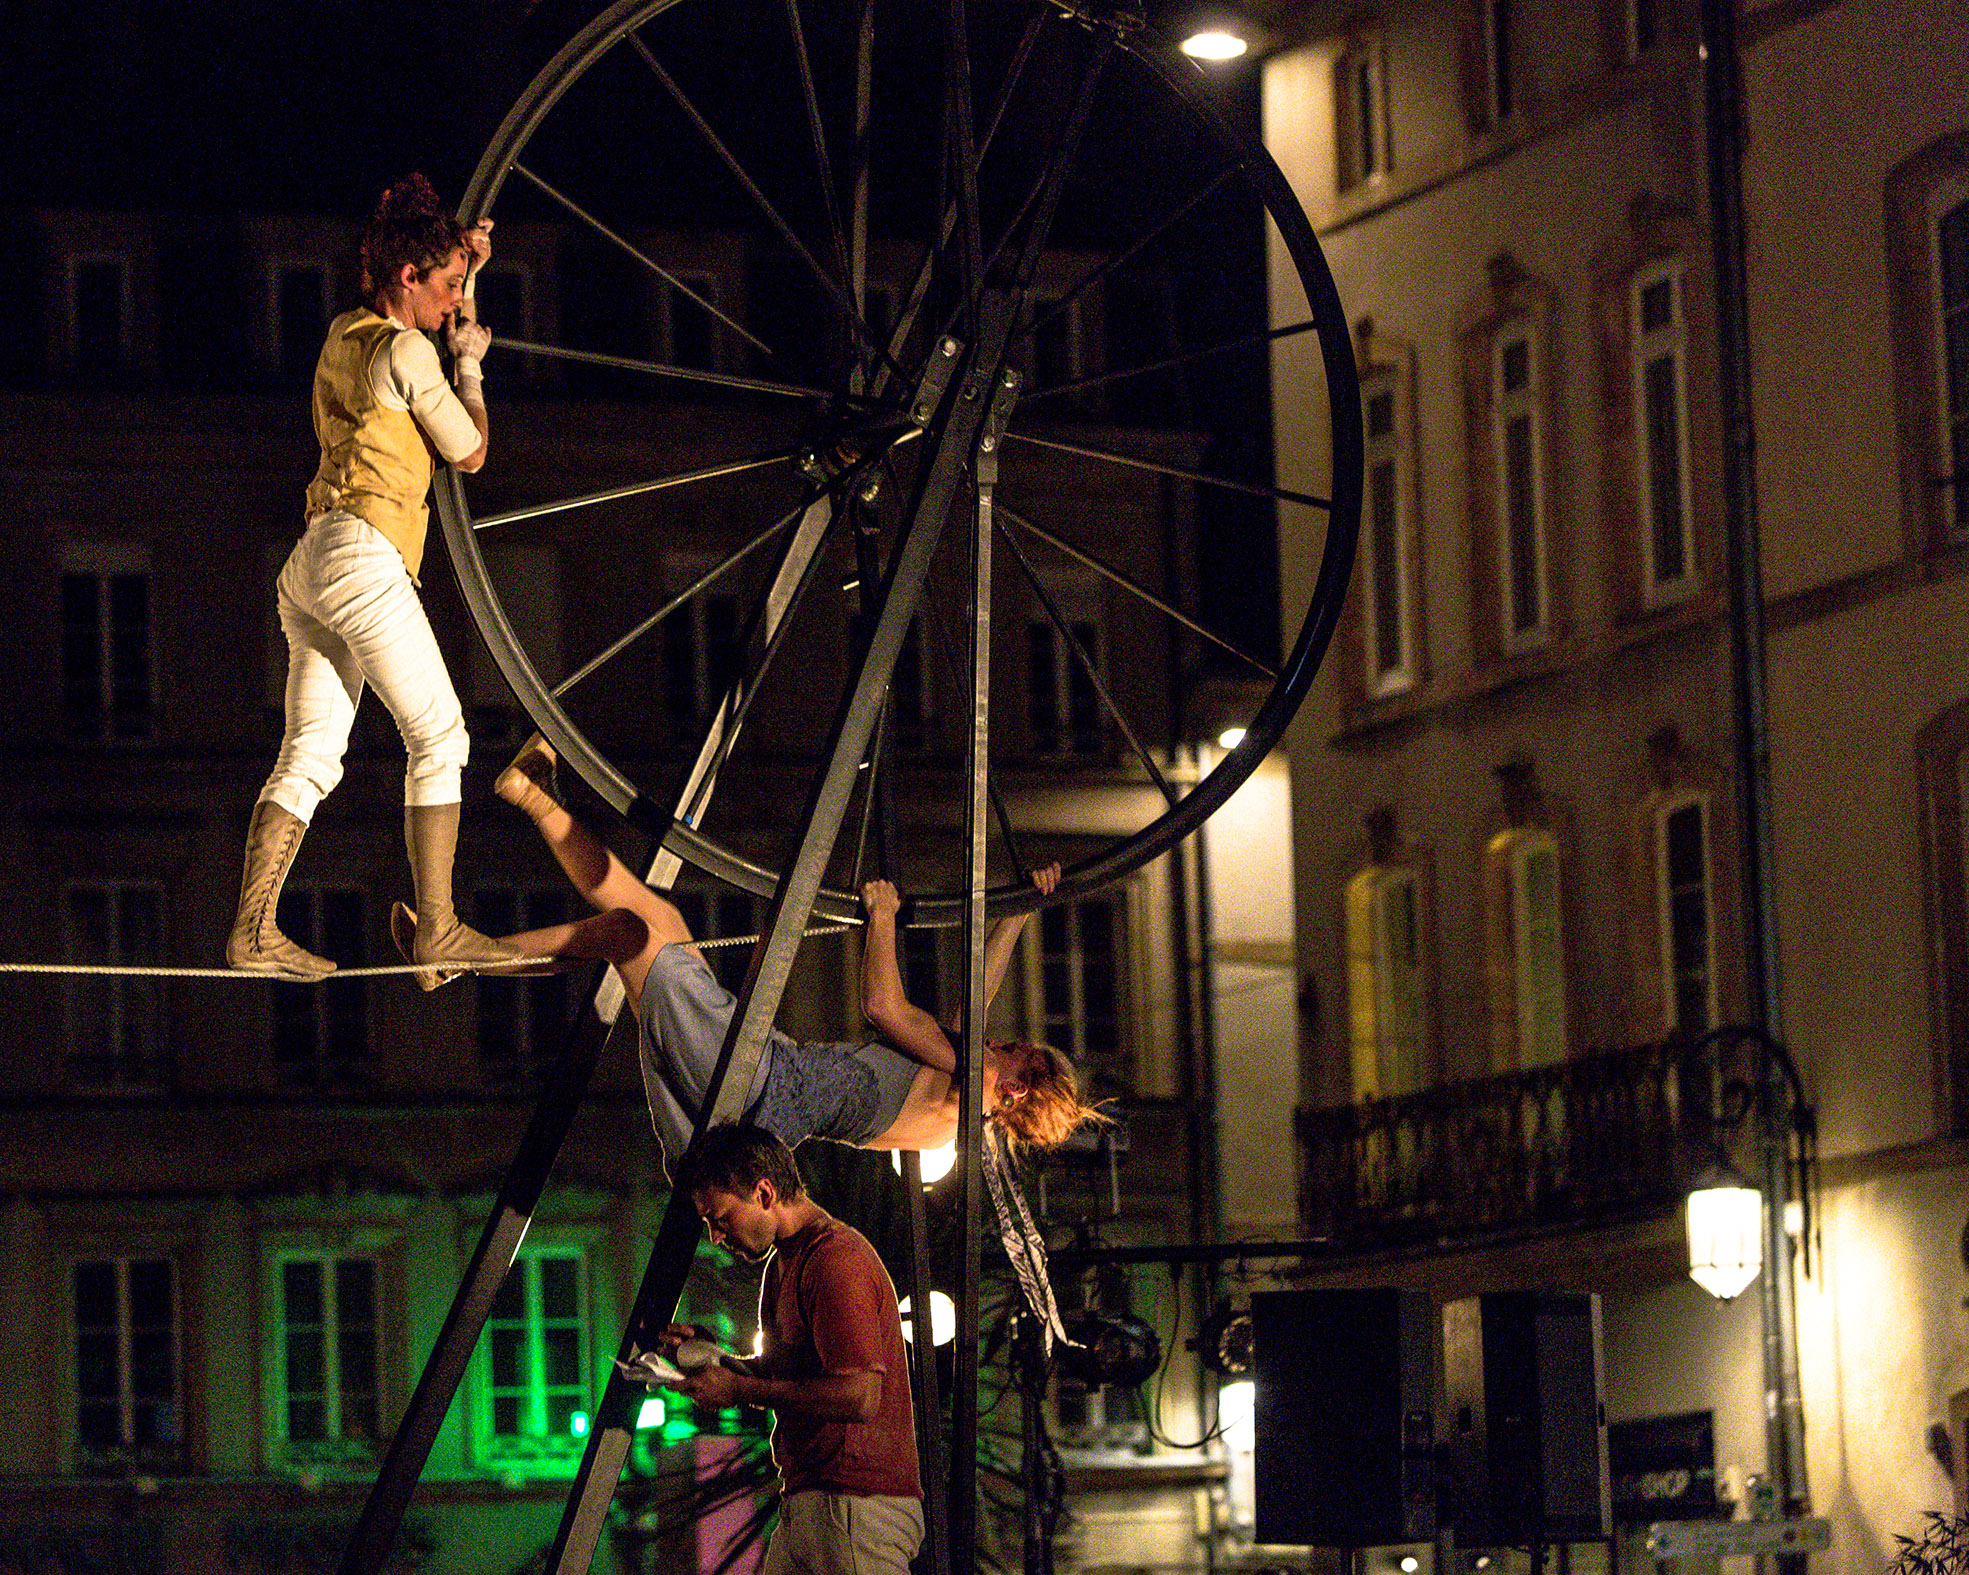 spectacles-sodade-cirque-rouage-mirabelle-metz-2015-marie-colette-becker-10